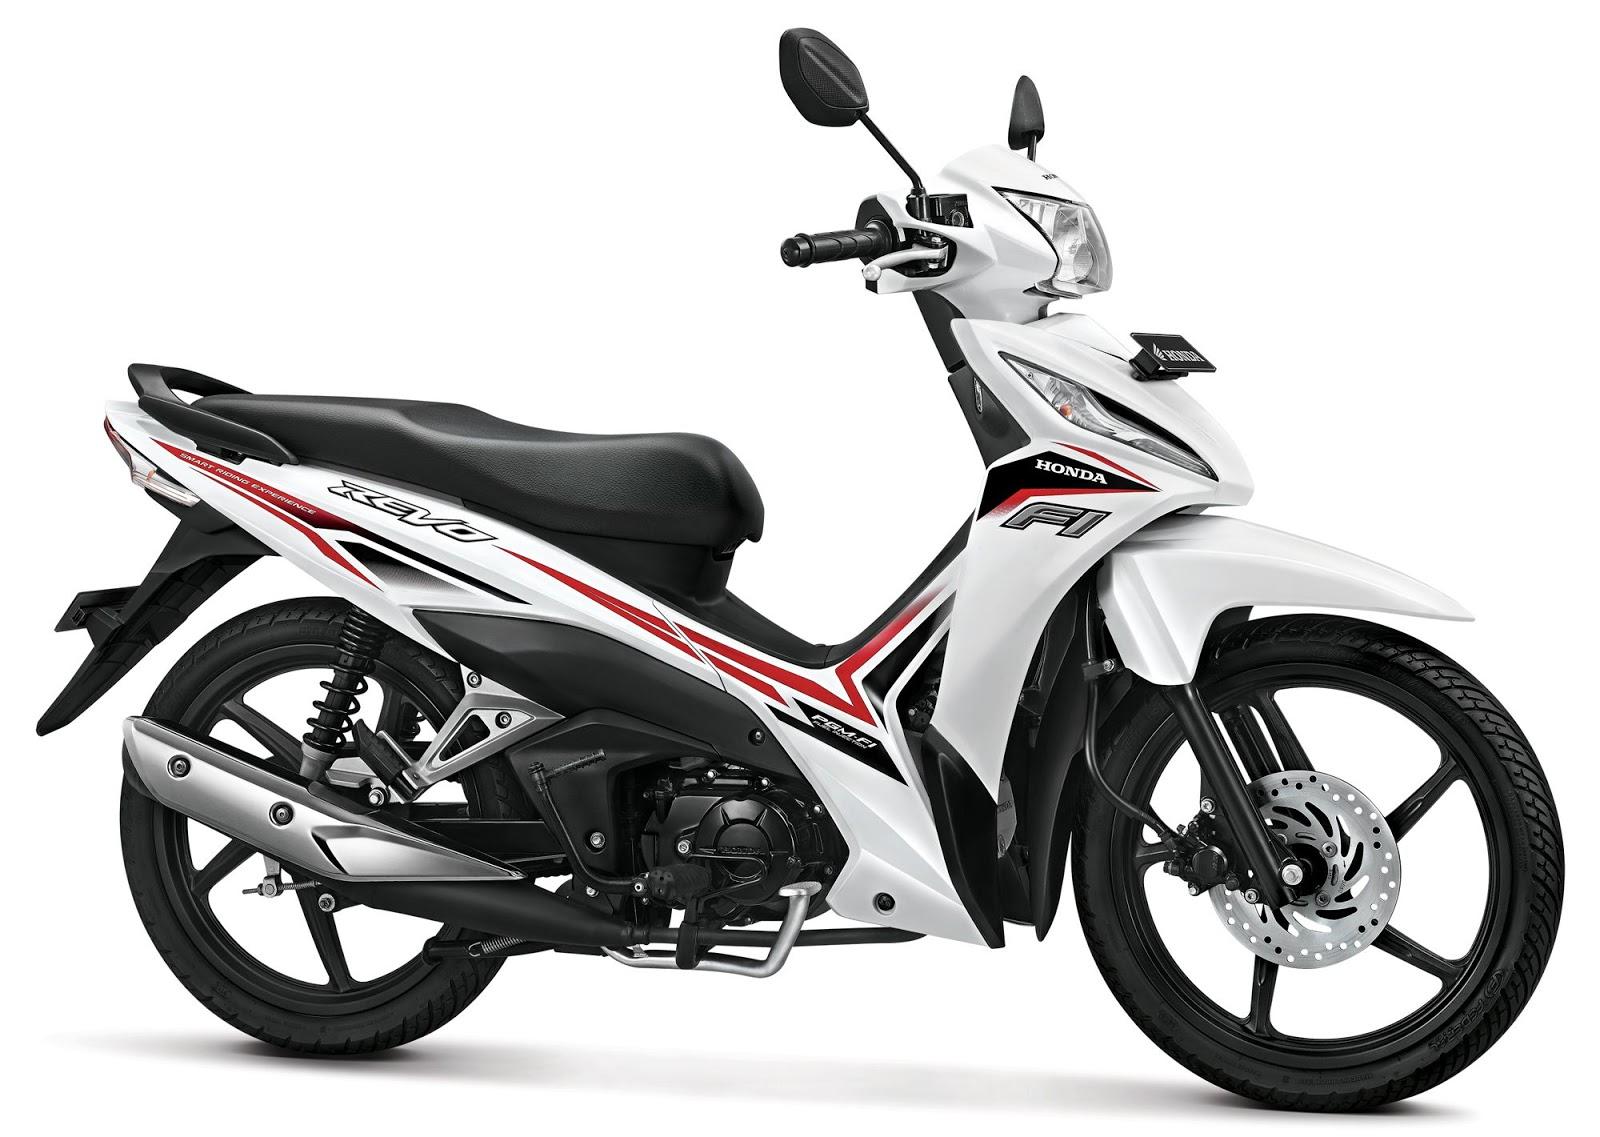 Daftar Harga Motor Honda Terbaru Januari 2020 Otomaniac